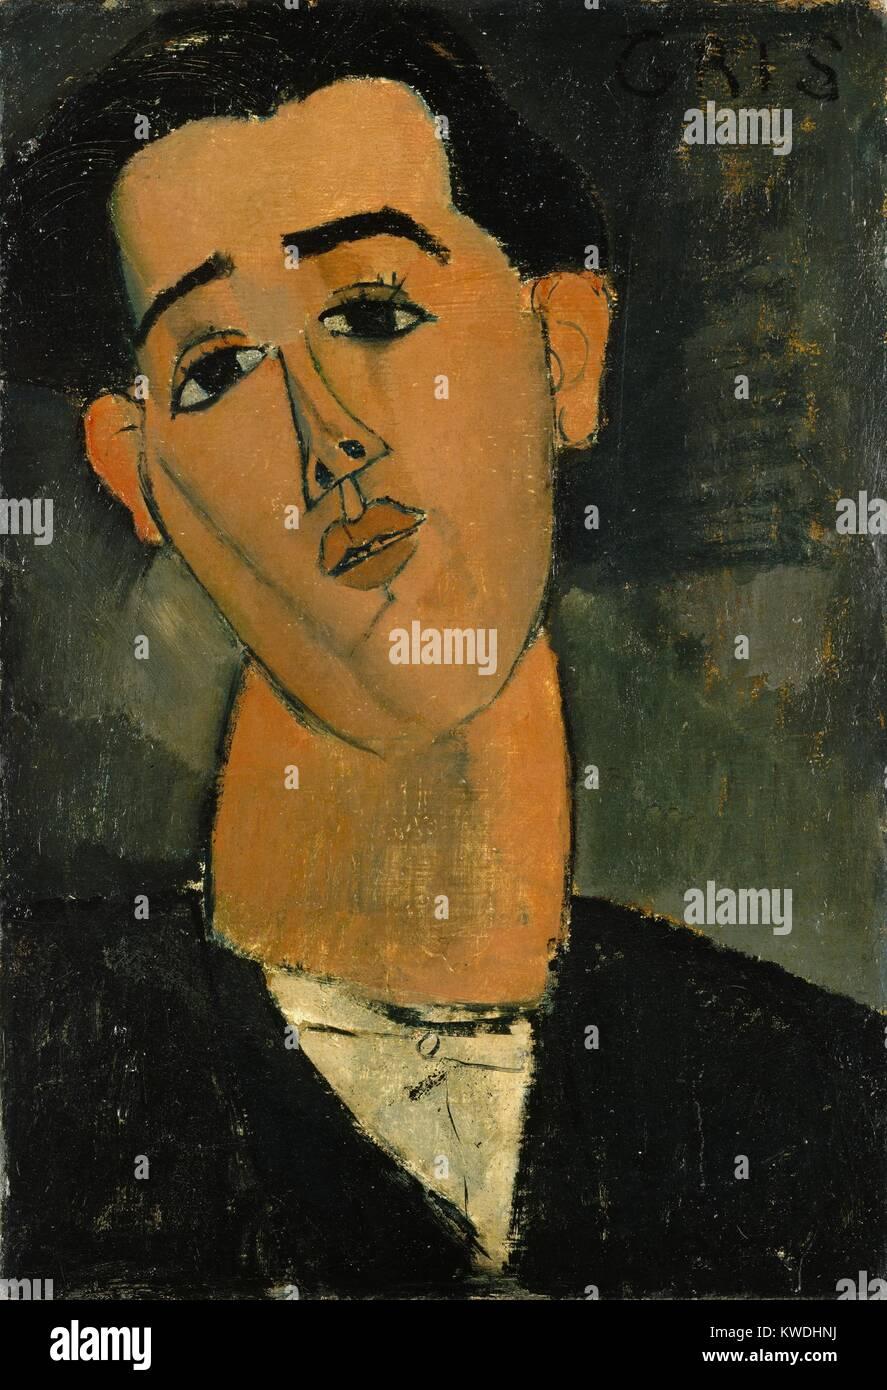 JUAN GRIS, por Amedeo Modigliani, 1915, pintura modernista Italiano, óleo sobre lienzo. Retrato del pintor Imagen De Stock